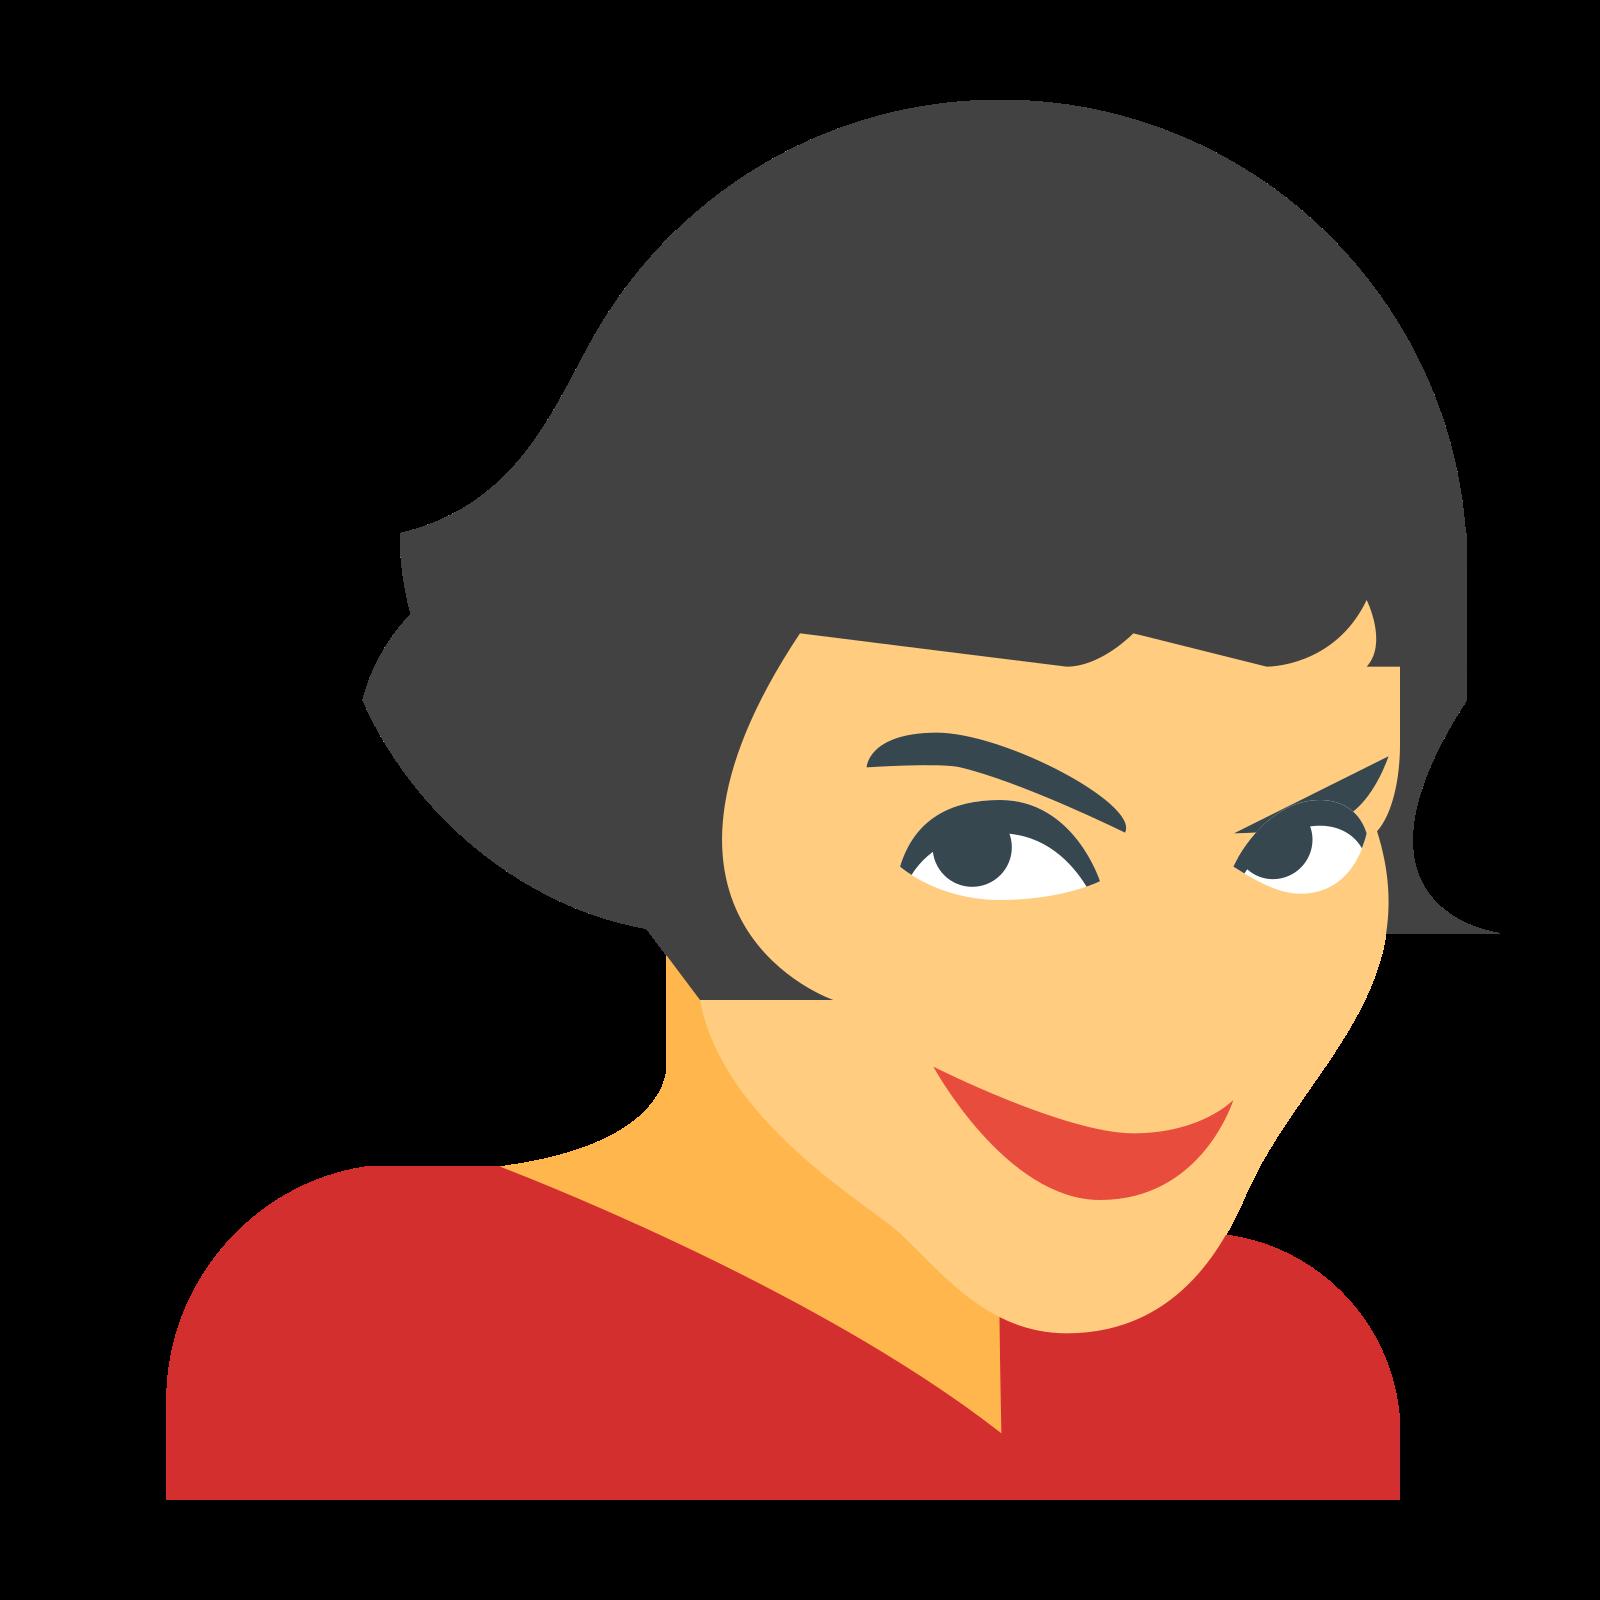 Amelie Poulain icon